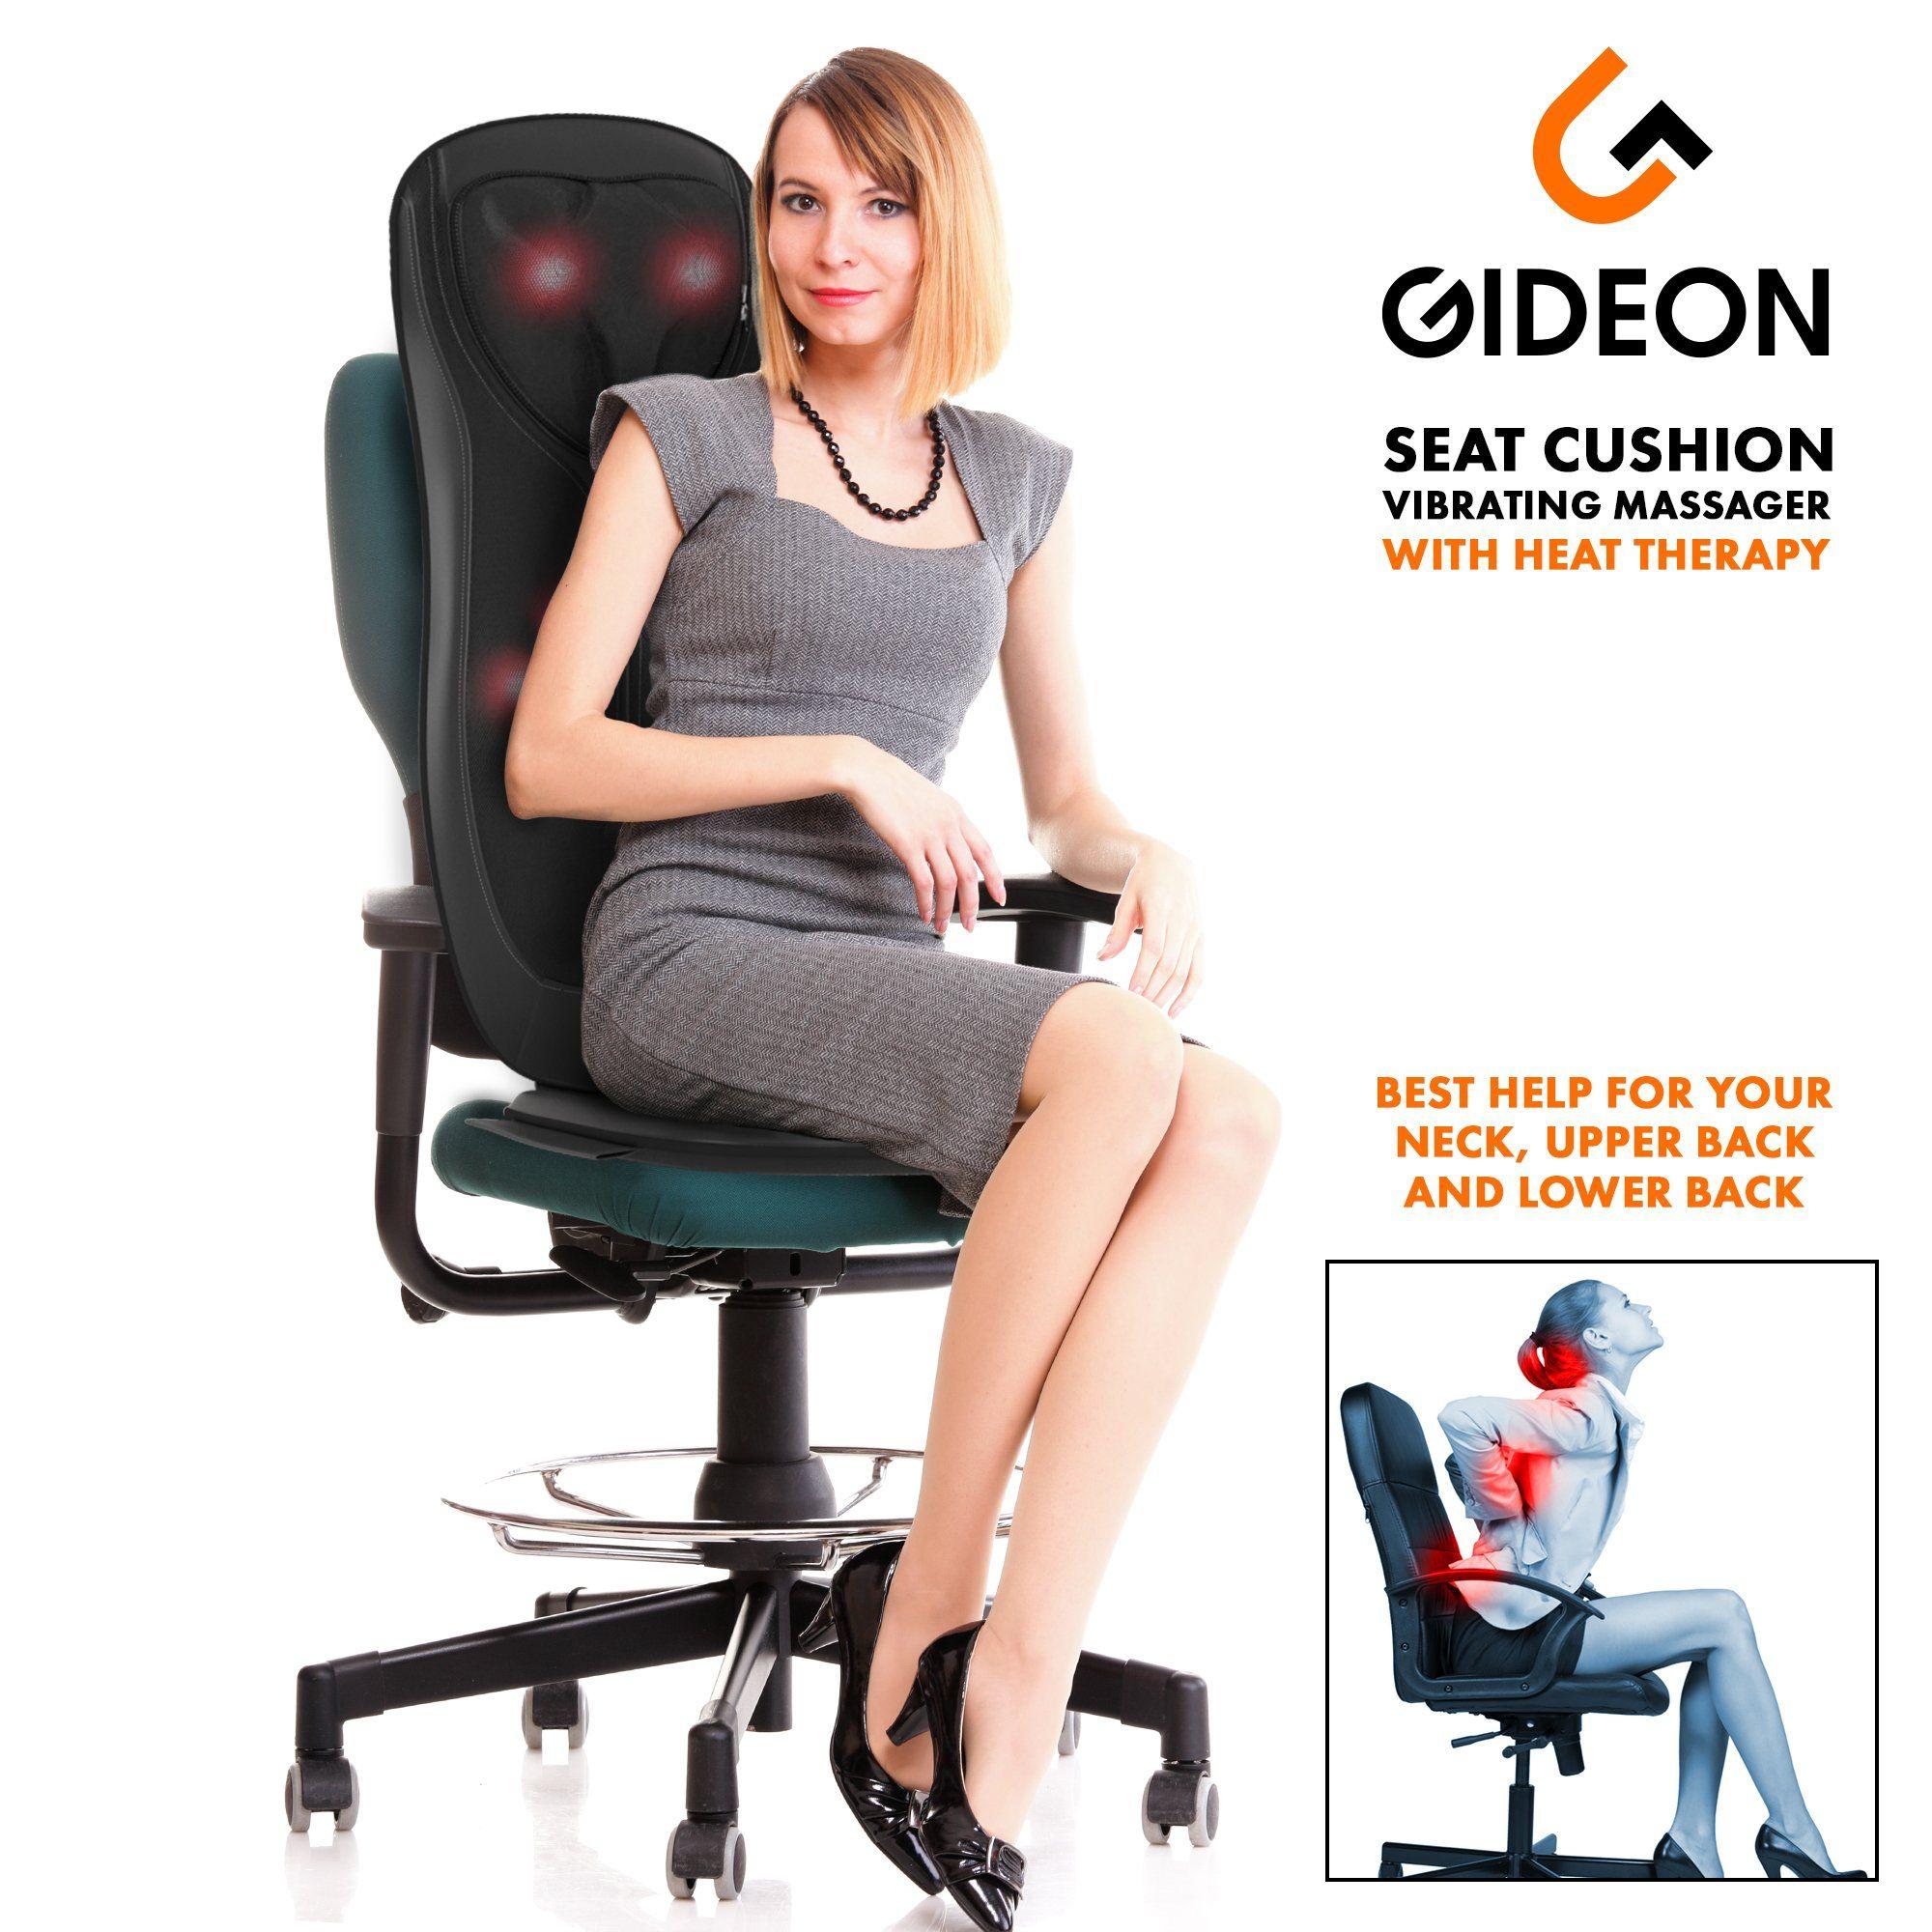 Gideon Luxury Sixprogram Fully Customizable Back And Neck